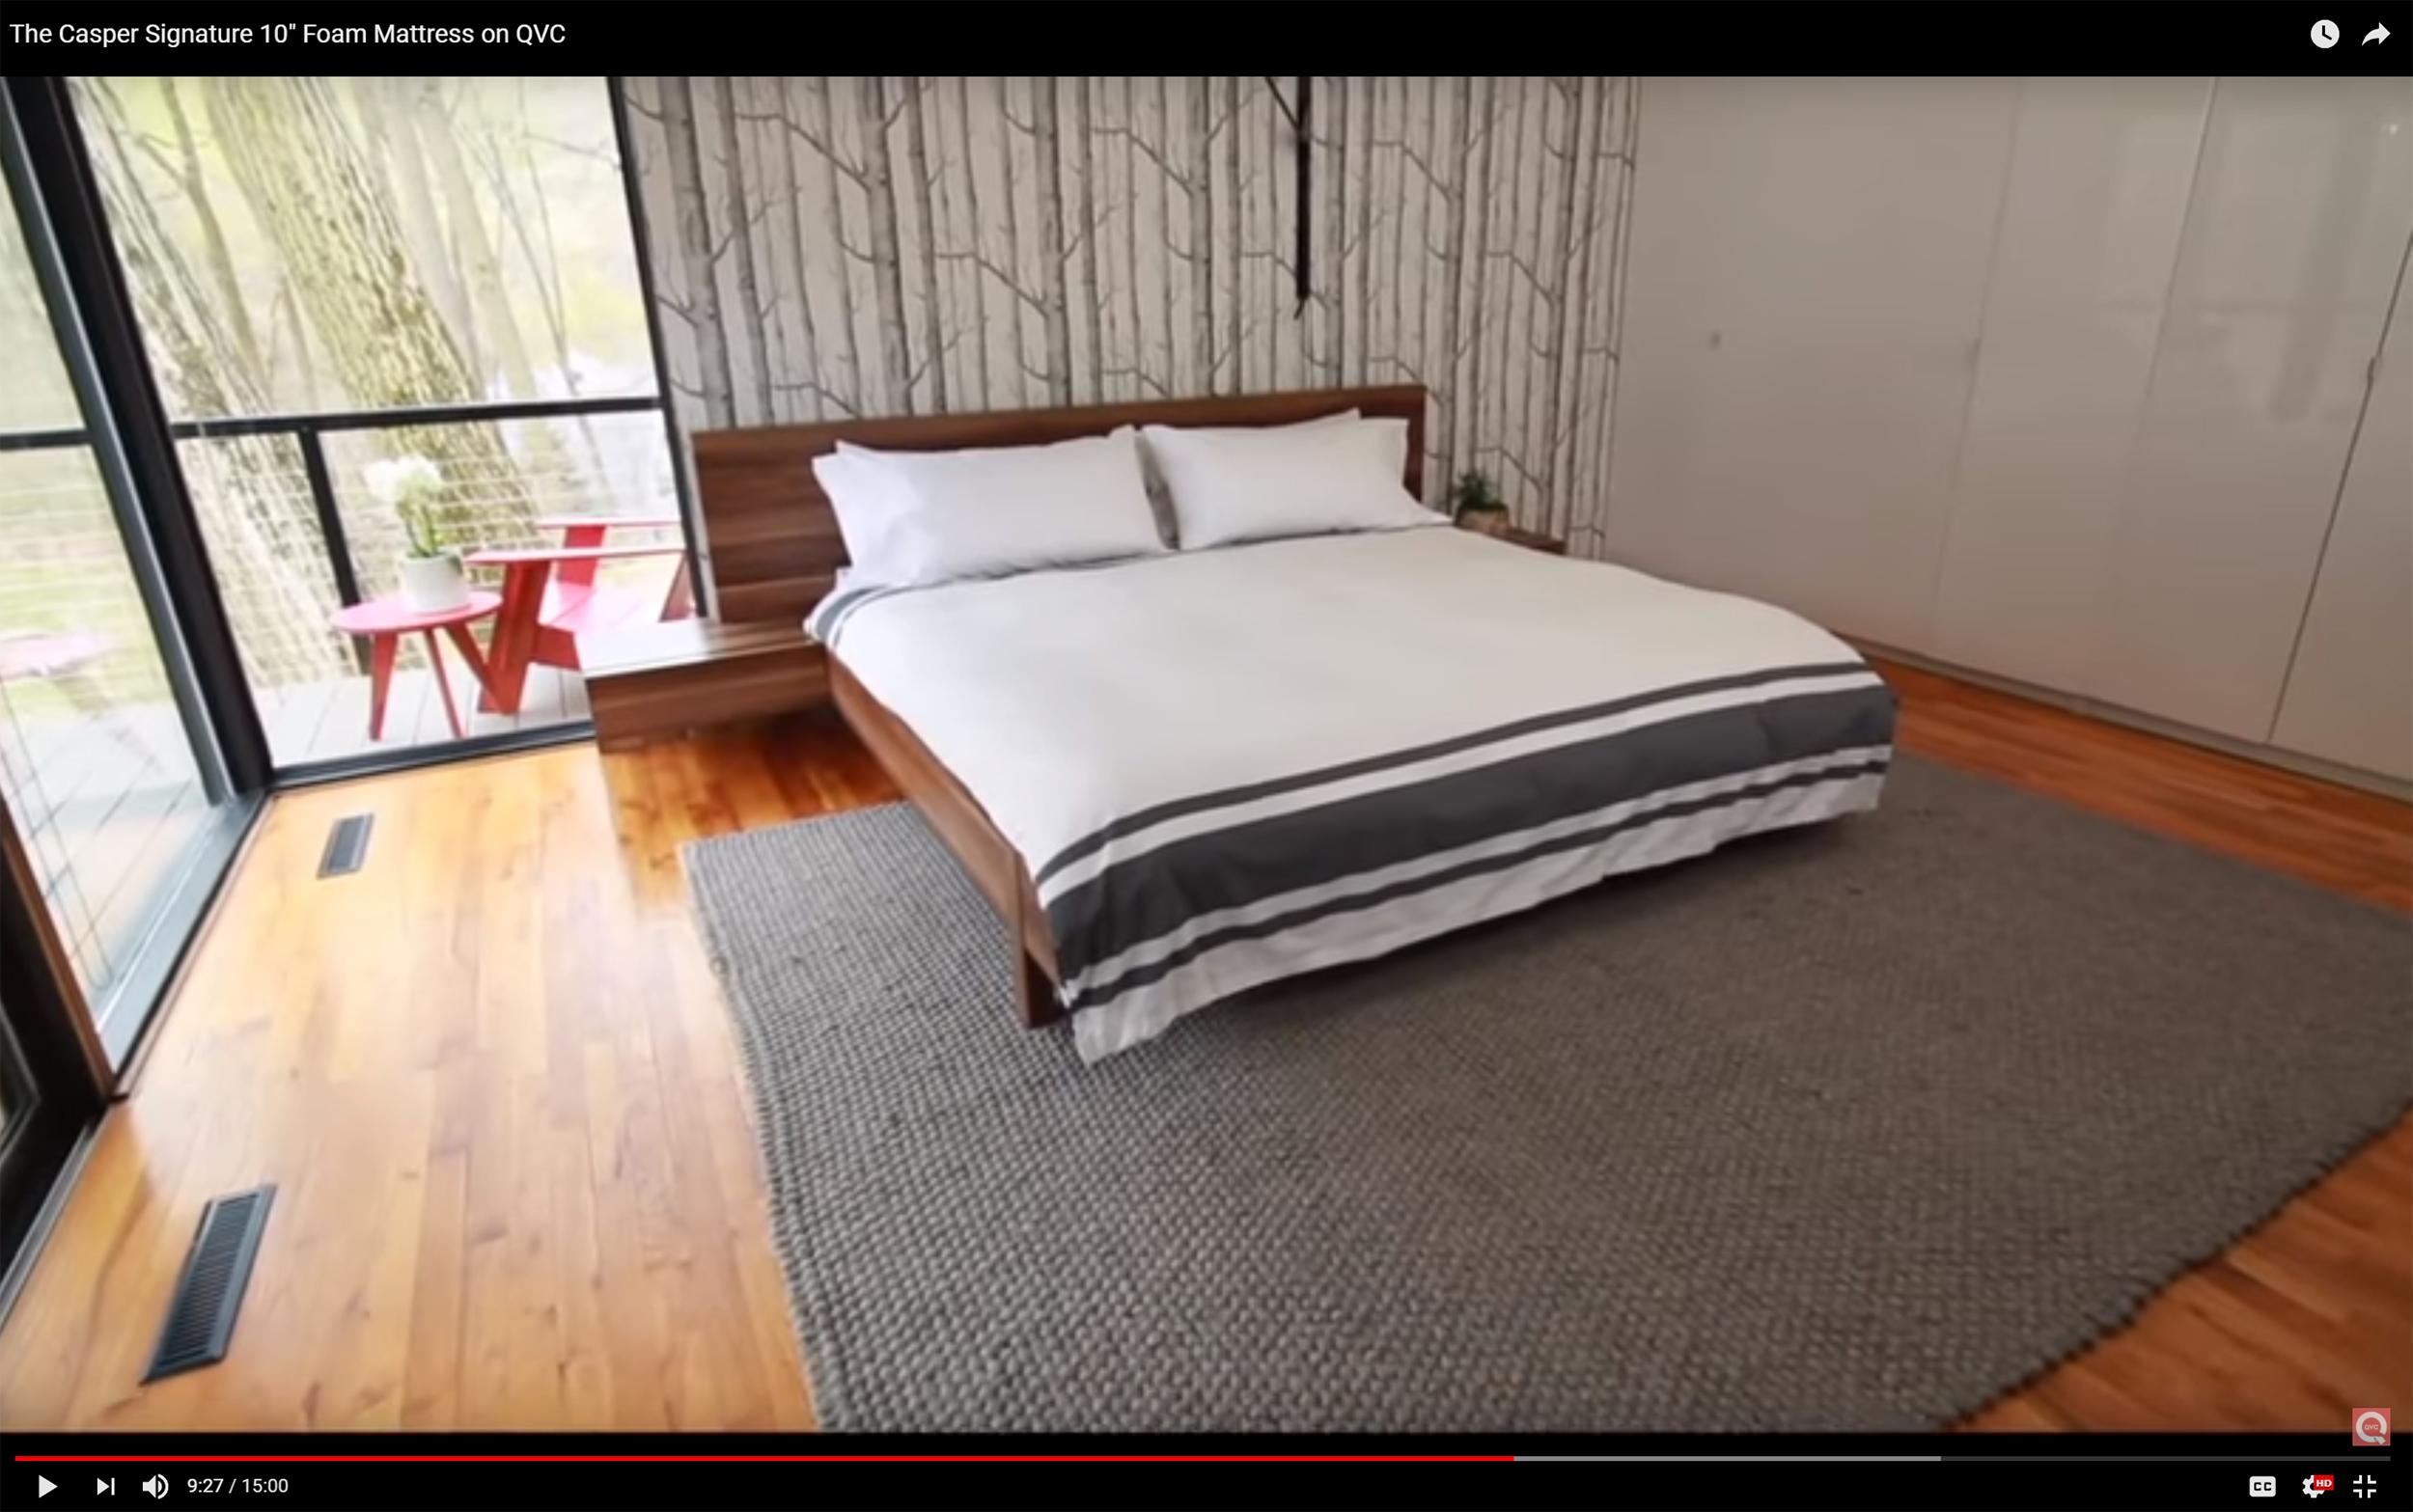 McELROY RENOVATION featured on QVC for Casper Mattress segment